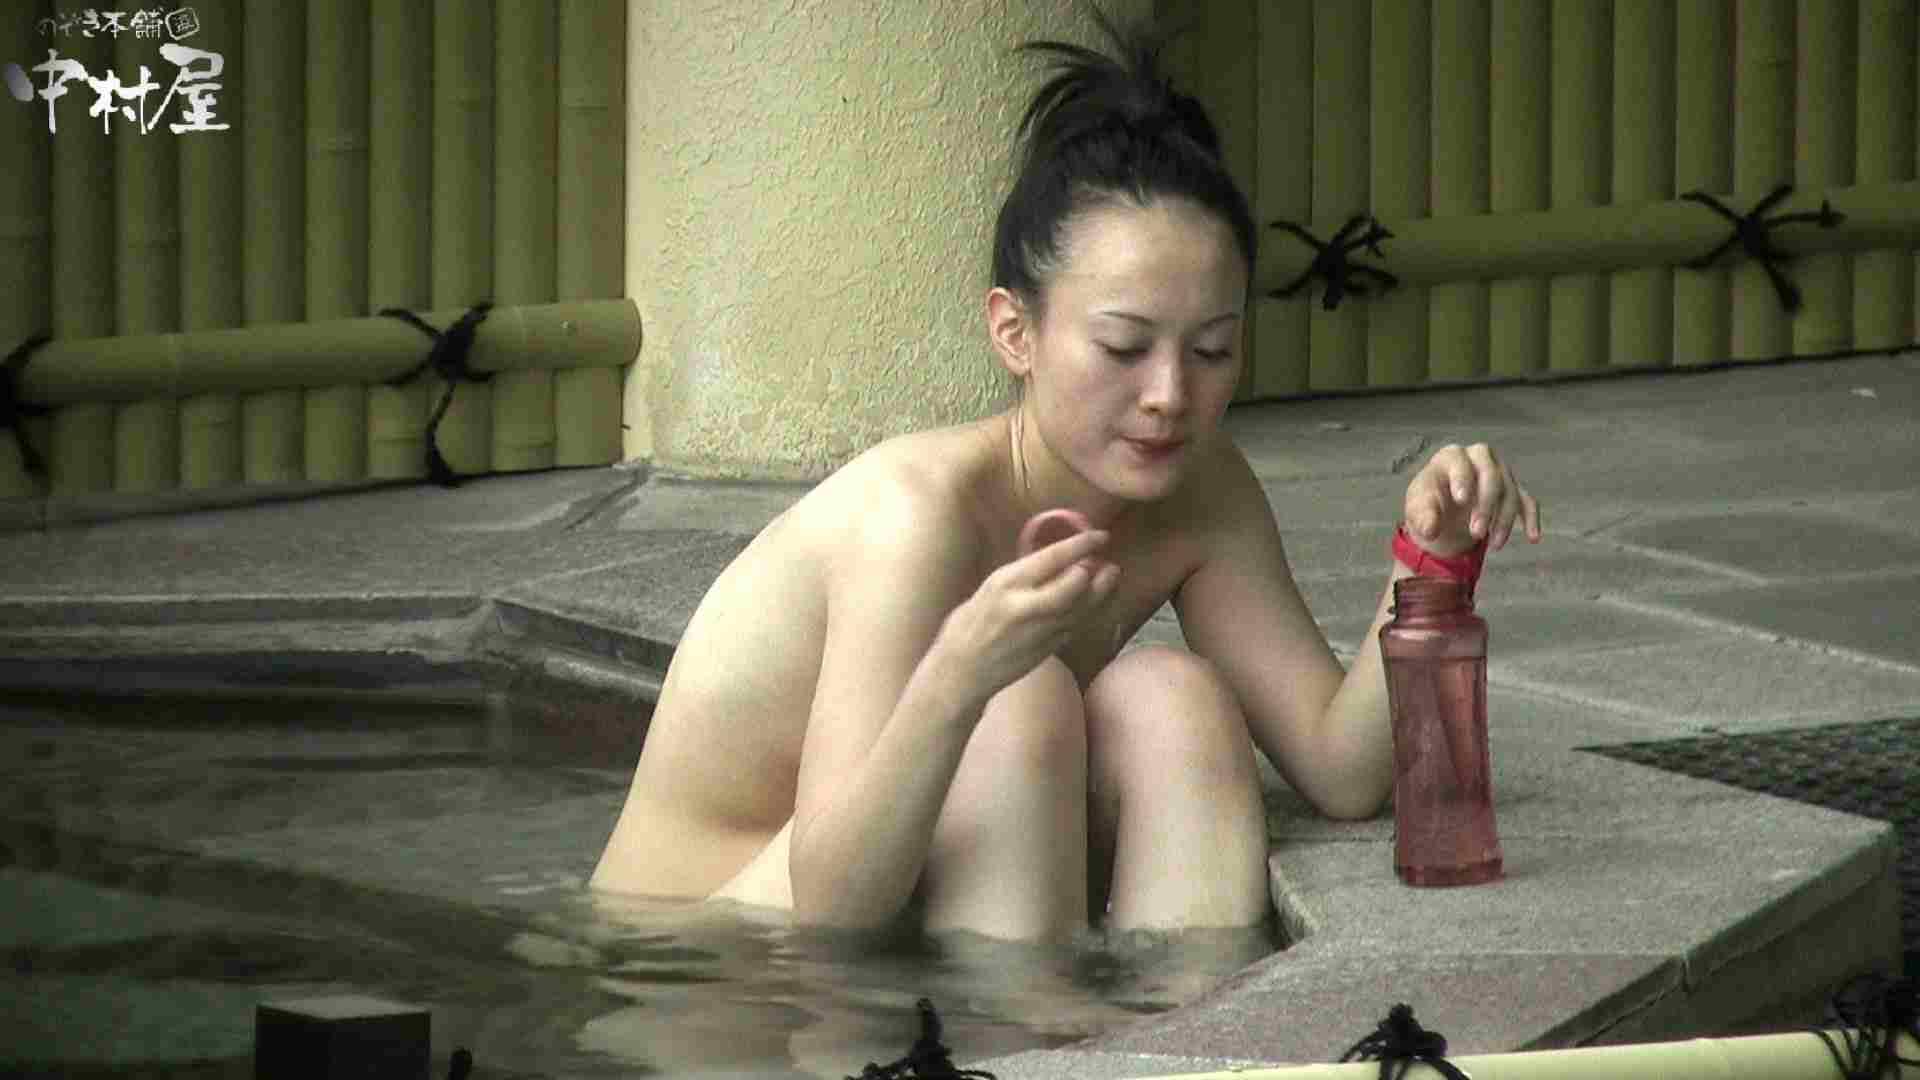 Aquaな露天風呂Vol.900 美しいOLの裸体   露天風呂突入  86pic 64